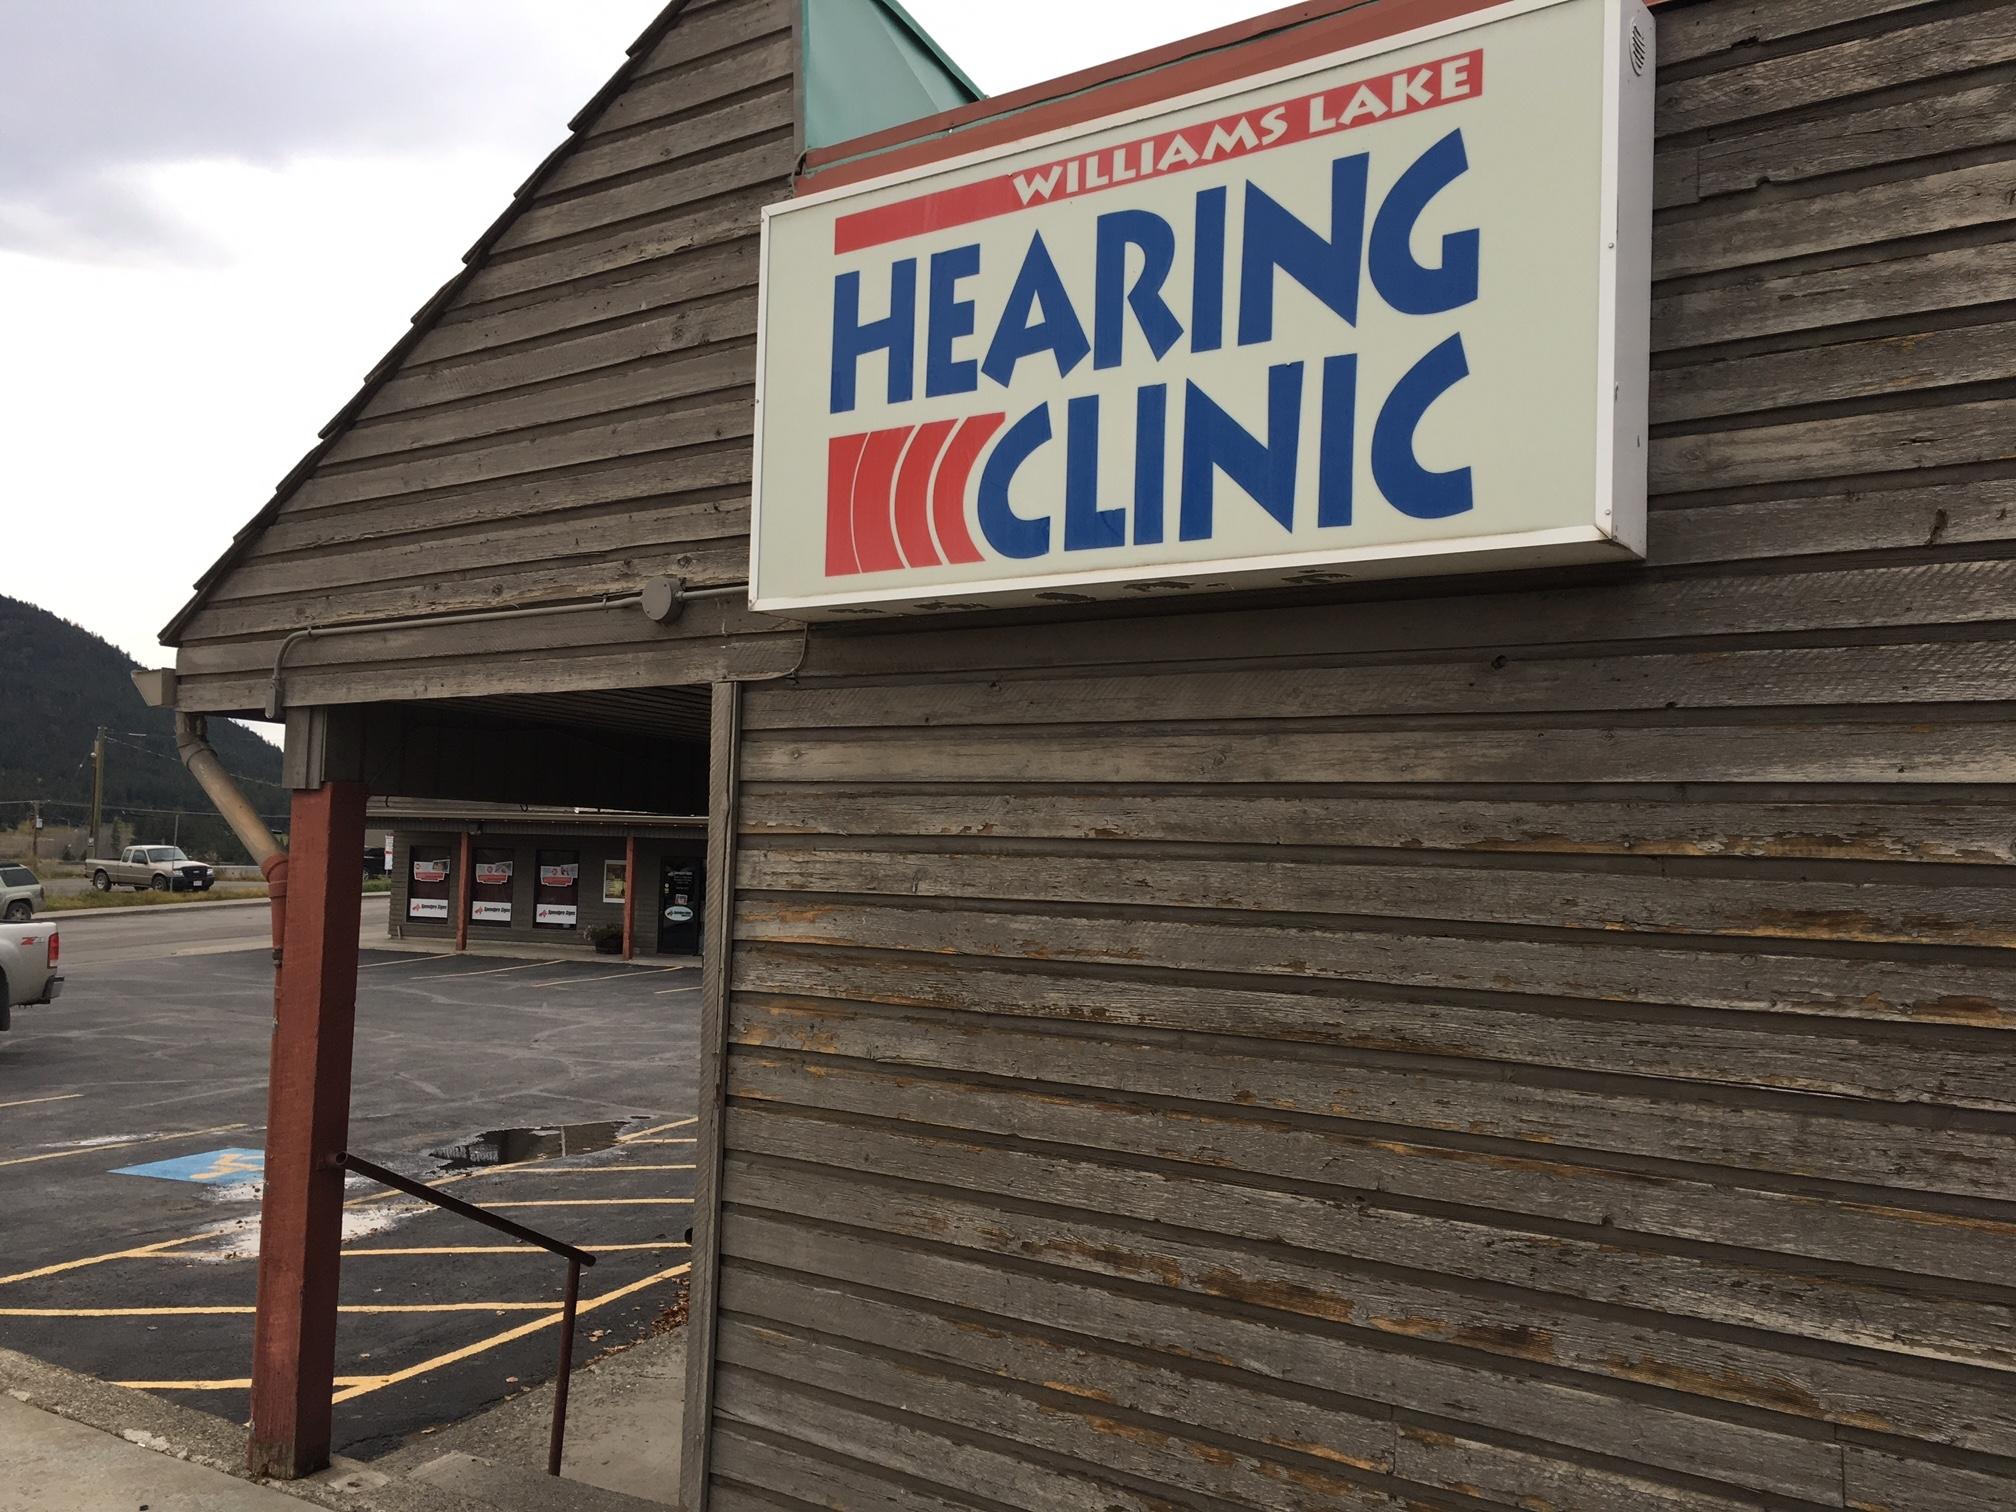 Williams Lake Hearing Clinic in Williams Lake: street view